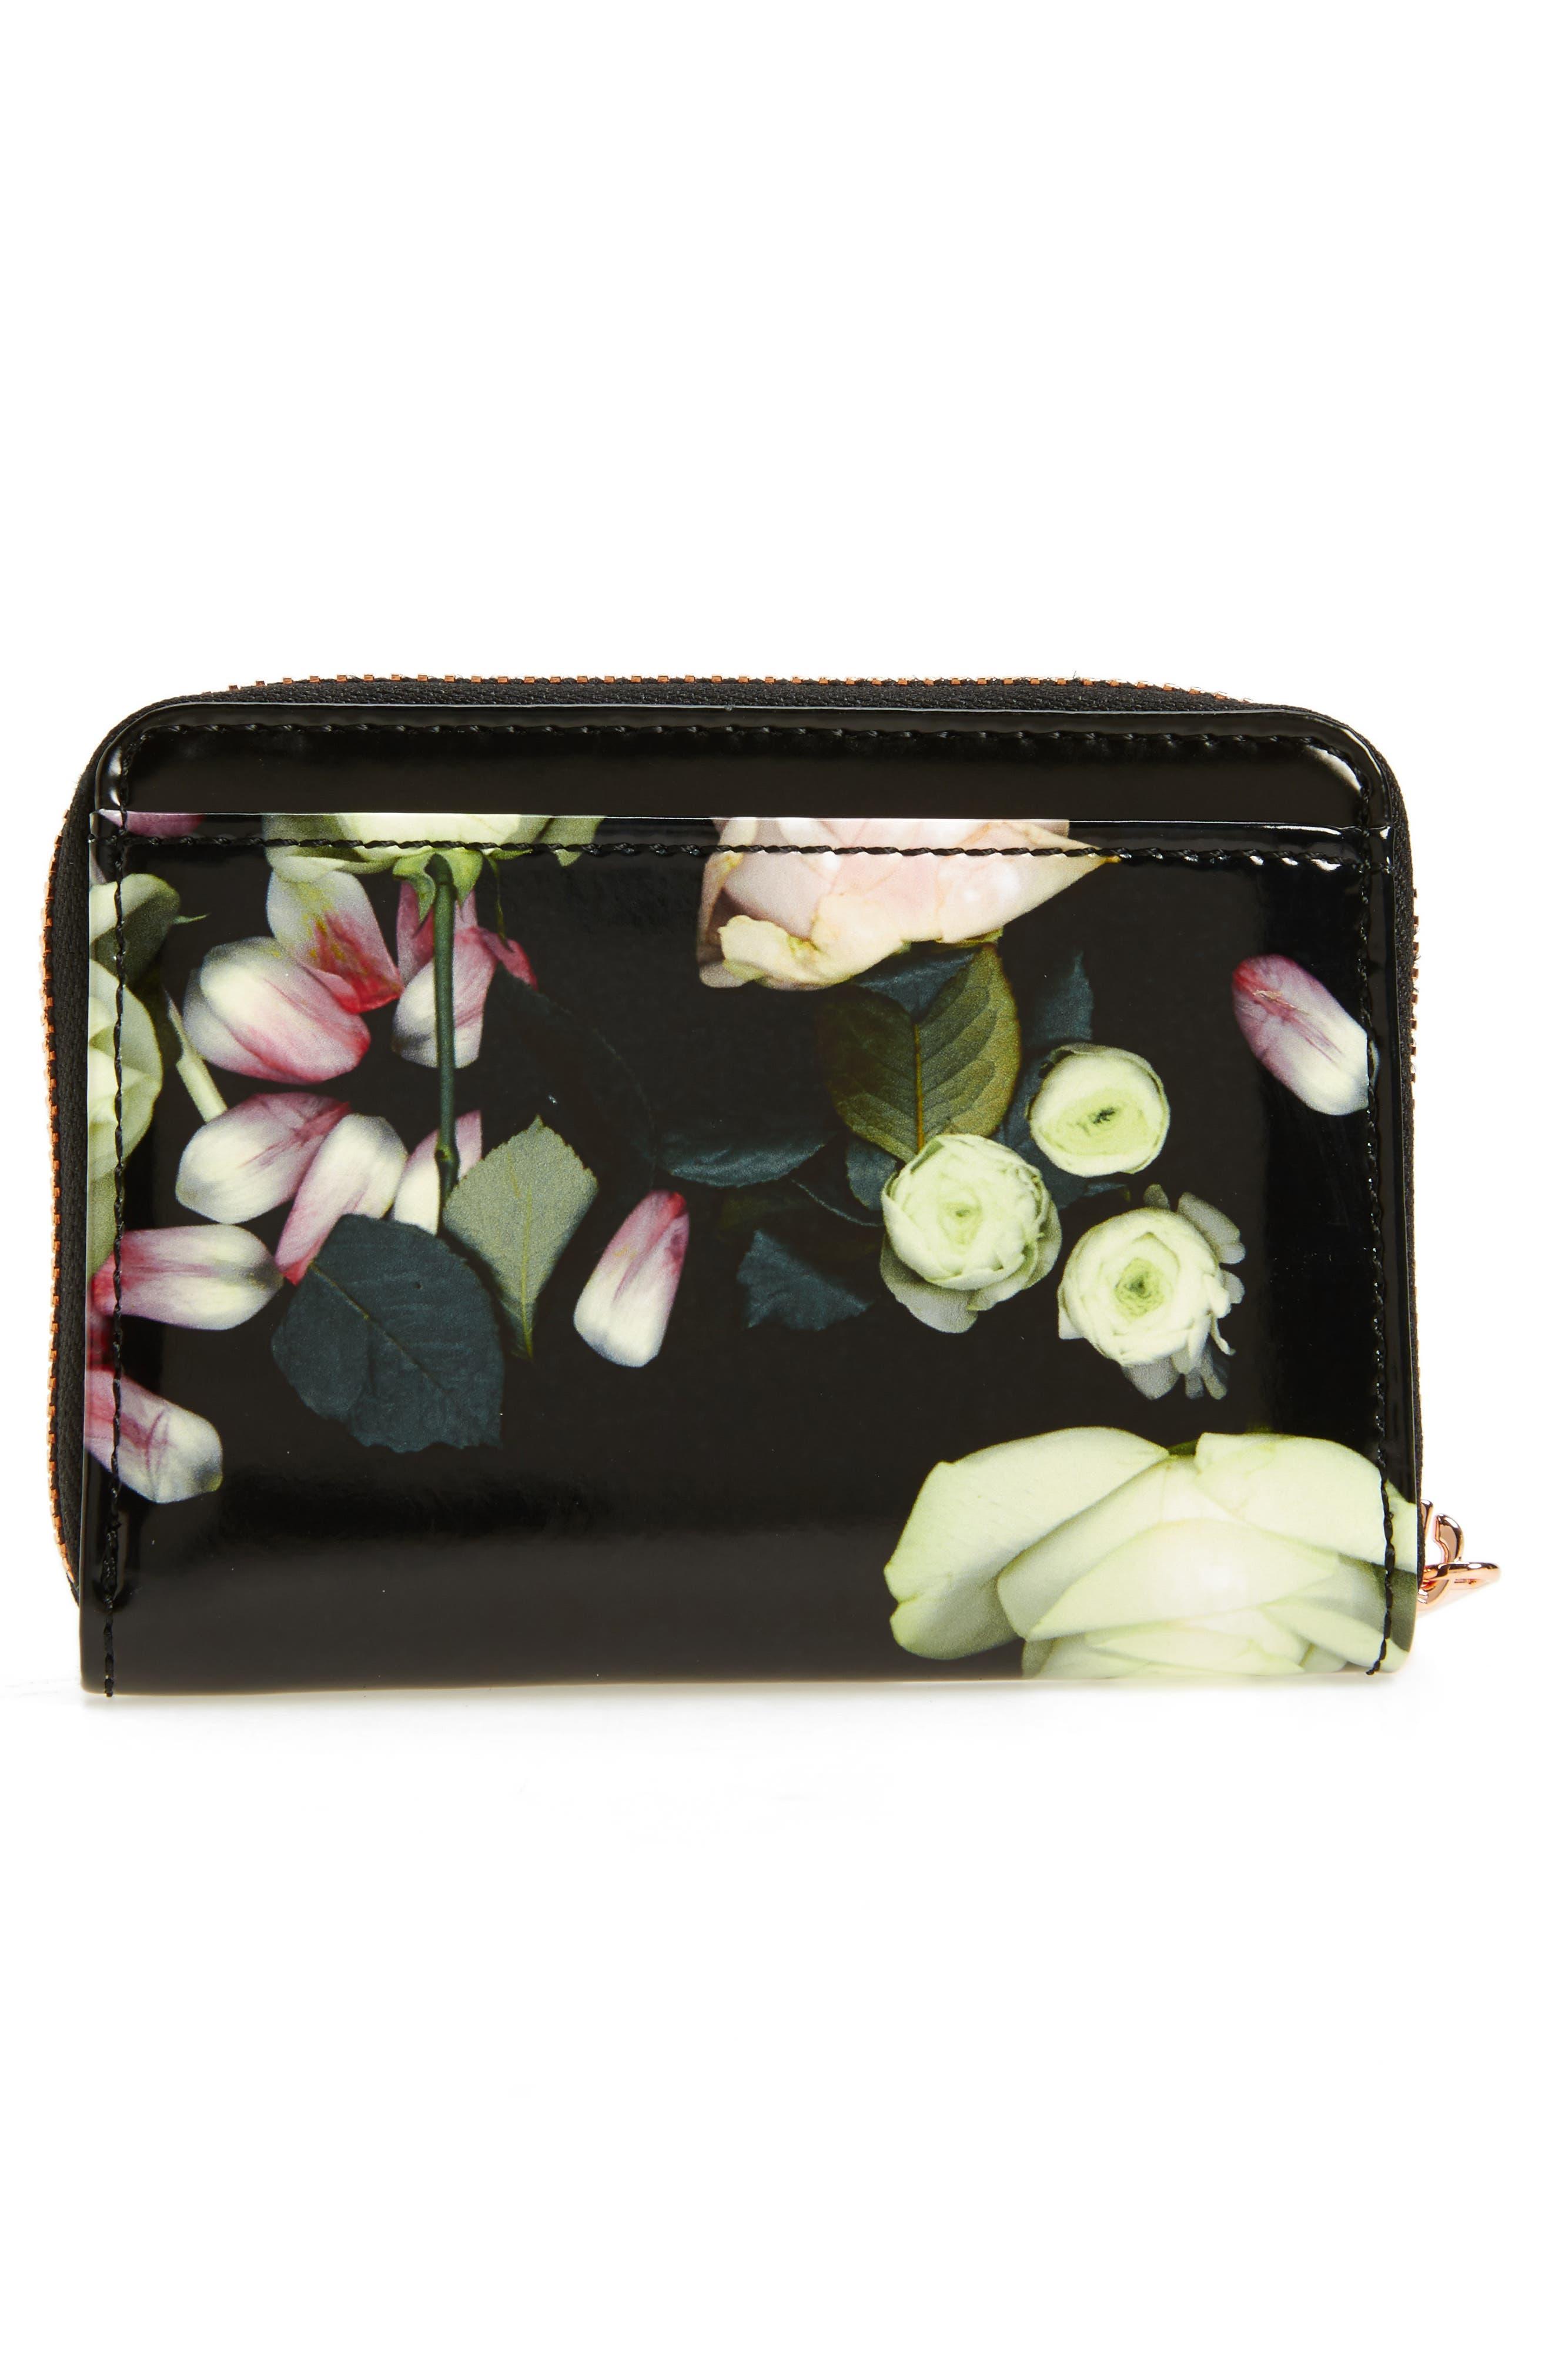 Mayycie Kensington Floral Leather Mini Purse,                             Alternate thumbnail 4, color,                             001